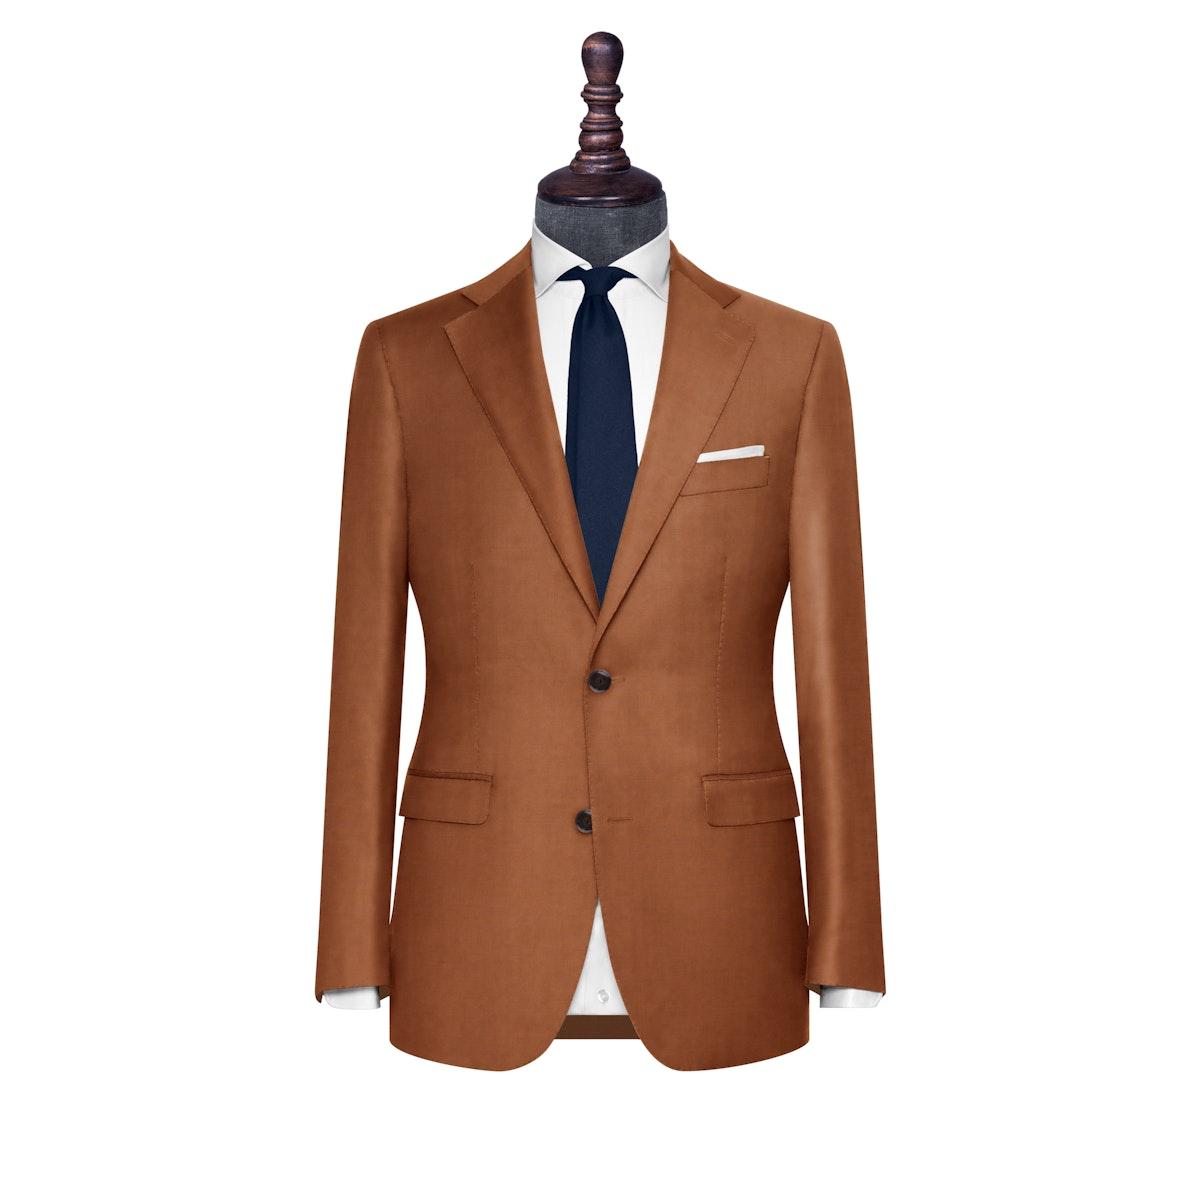 InStitchu Collection The Scafatti Rust Orange Wool Jacket